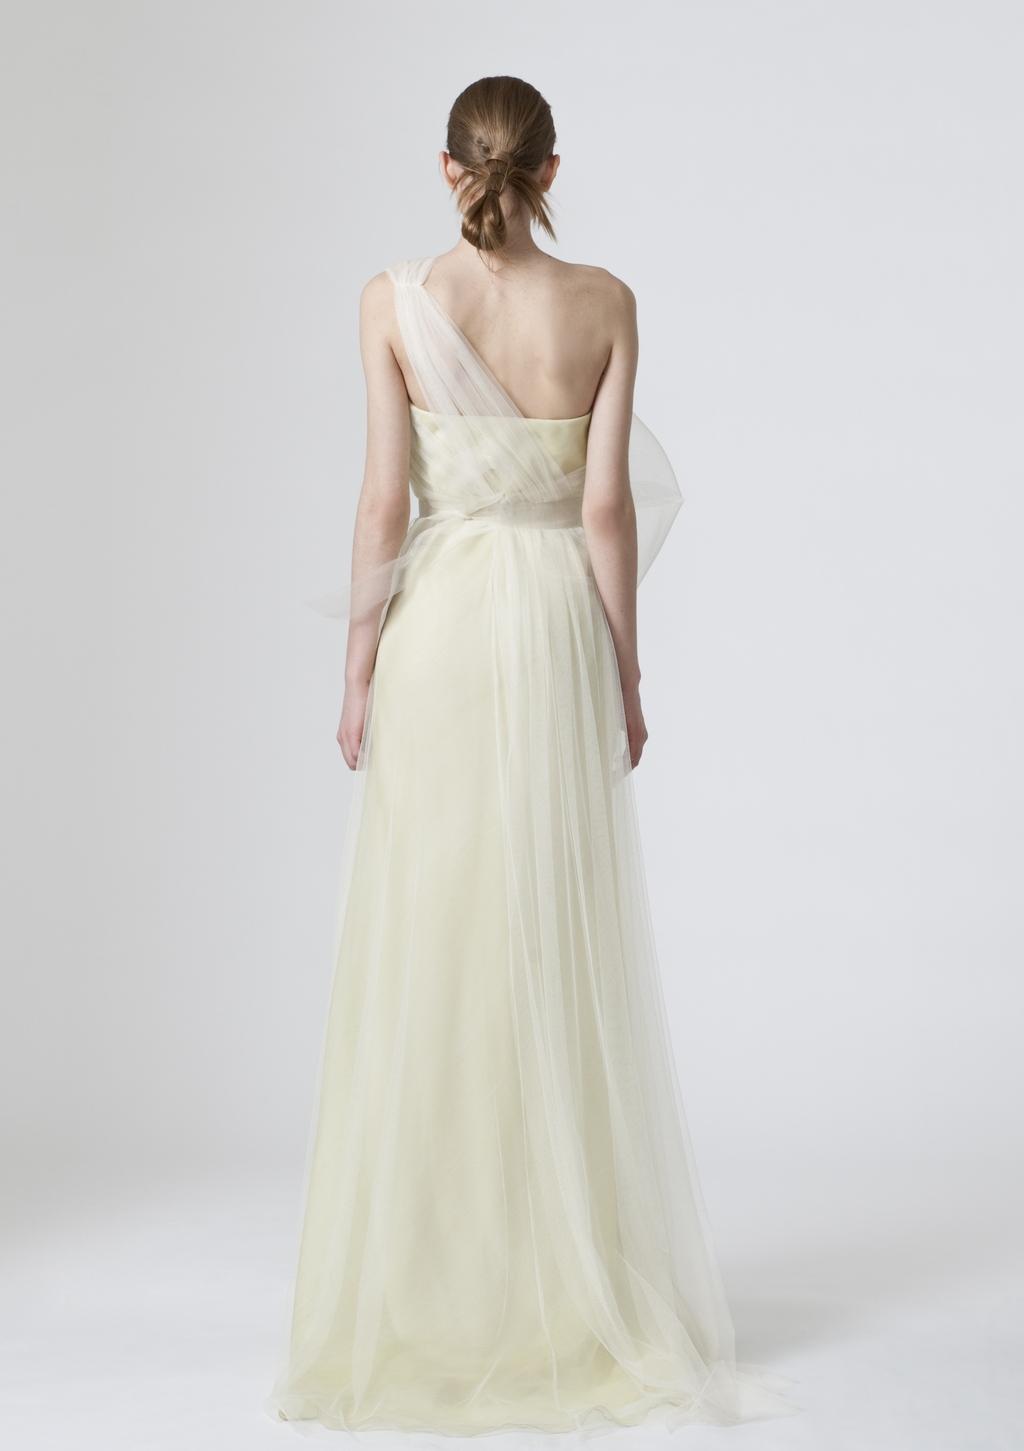 Vera-wang-wedding-dresses-spring-2010-4-back.full